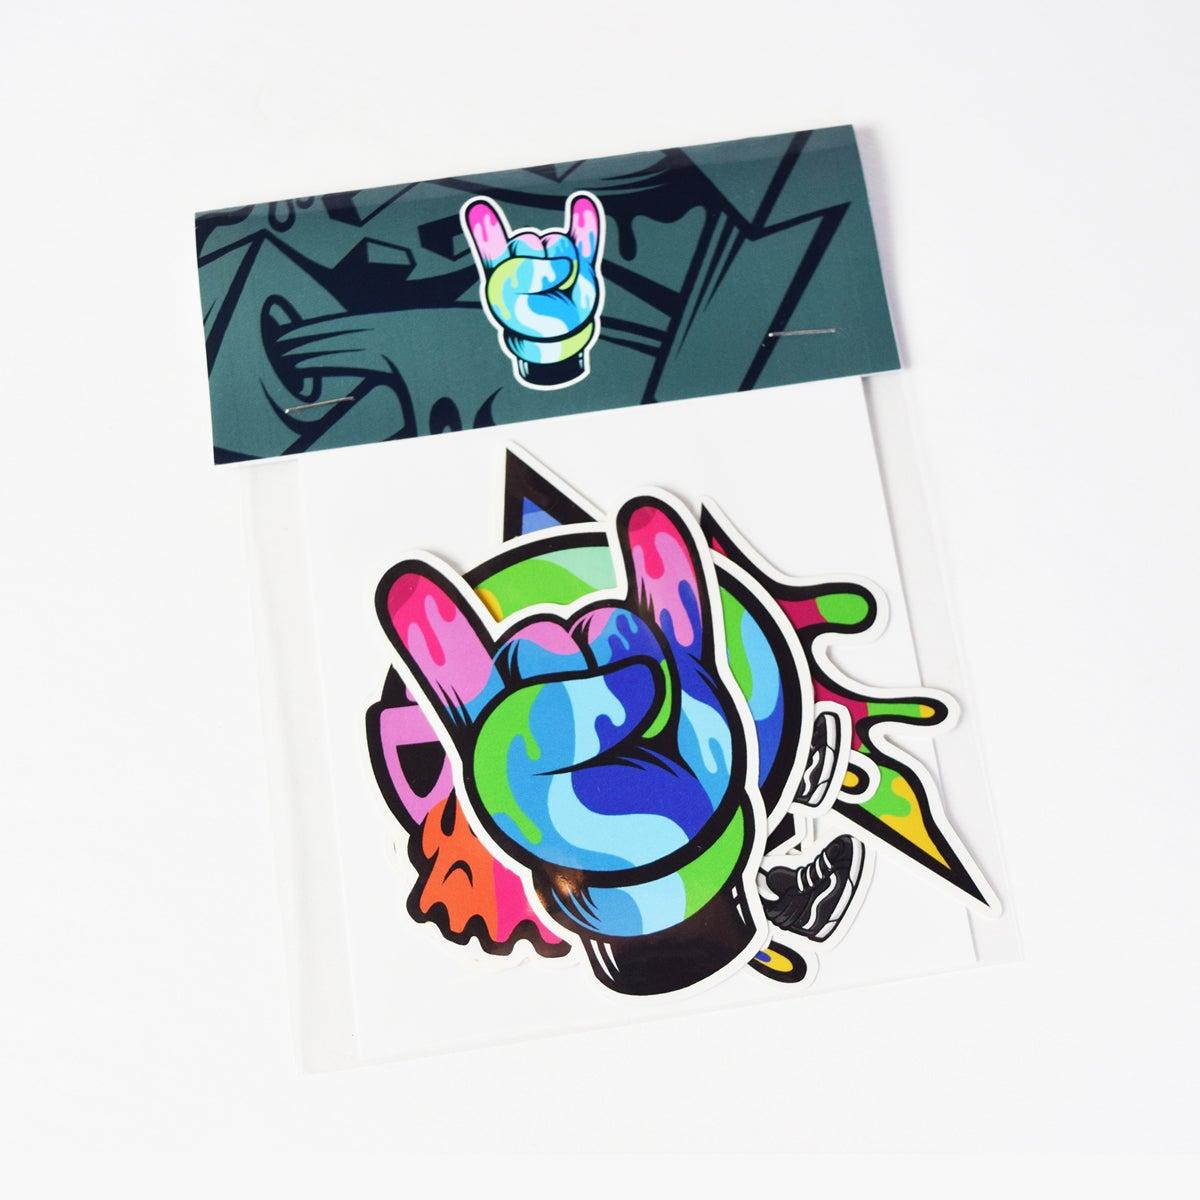 Image of MC Sticker Pack Vol. 1